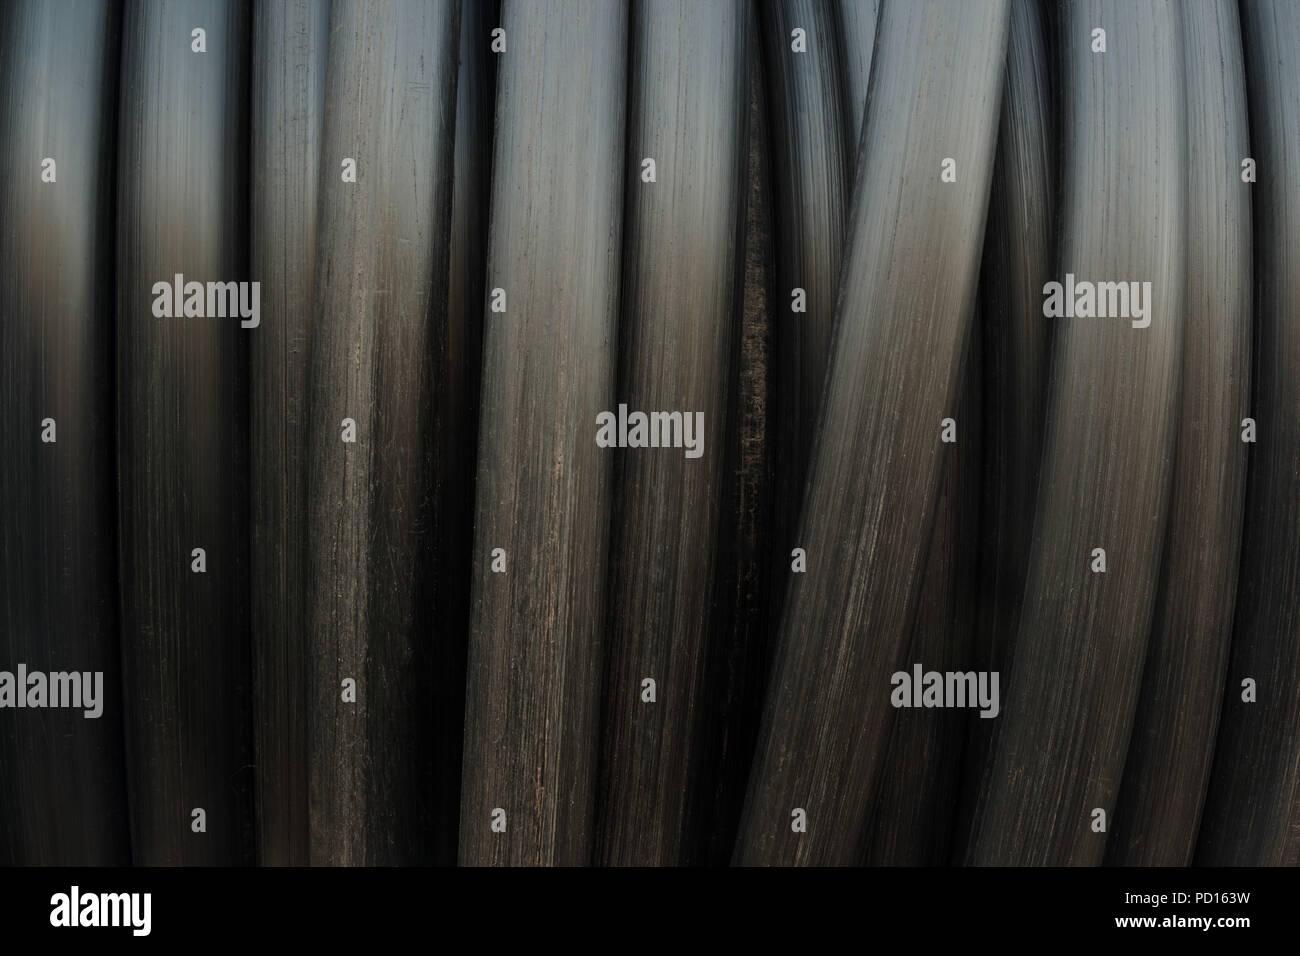 tutti i tubi neri